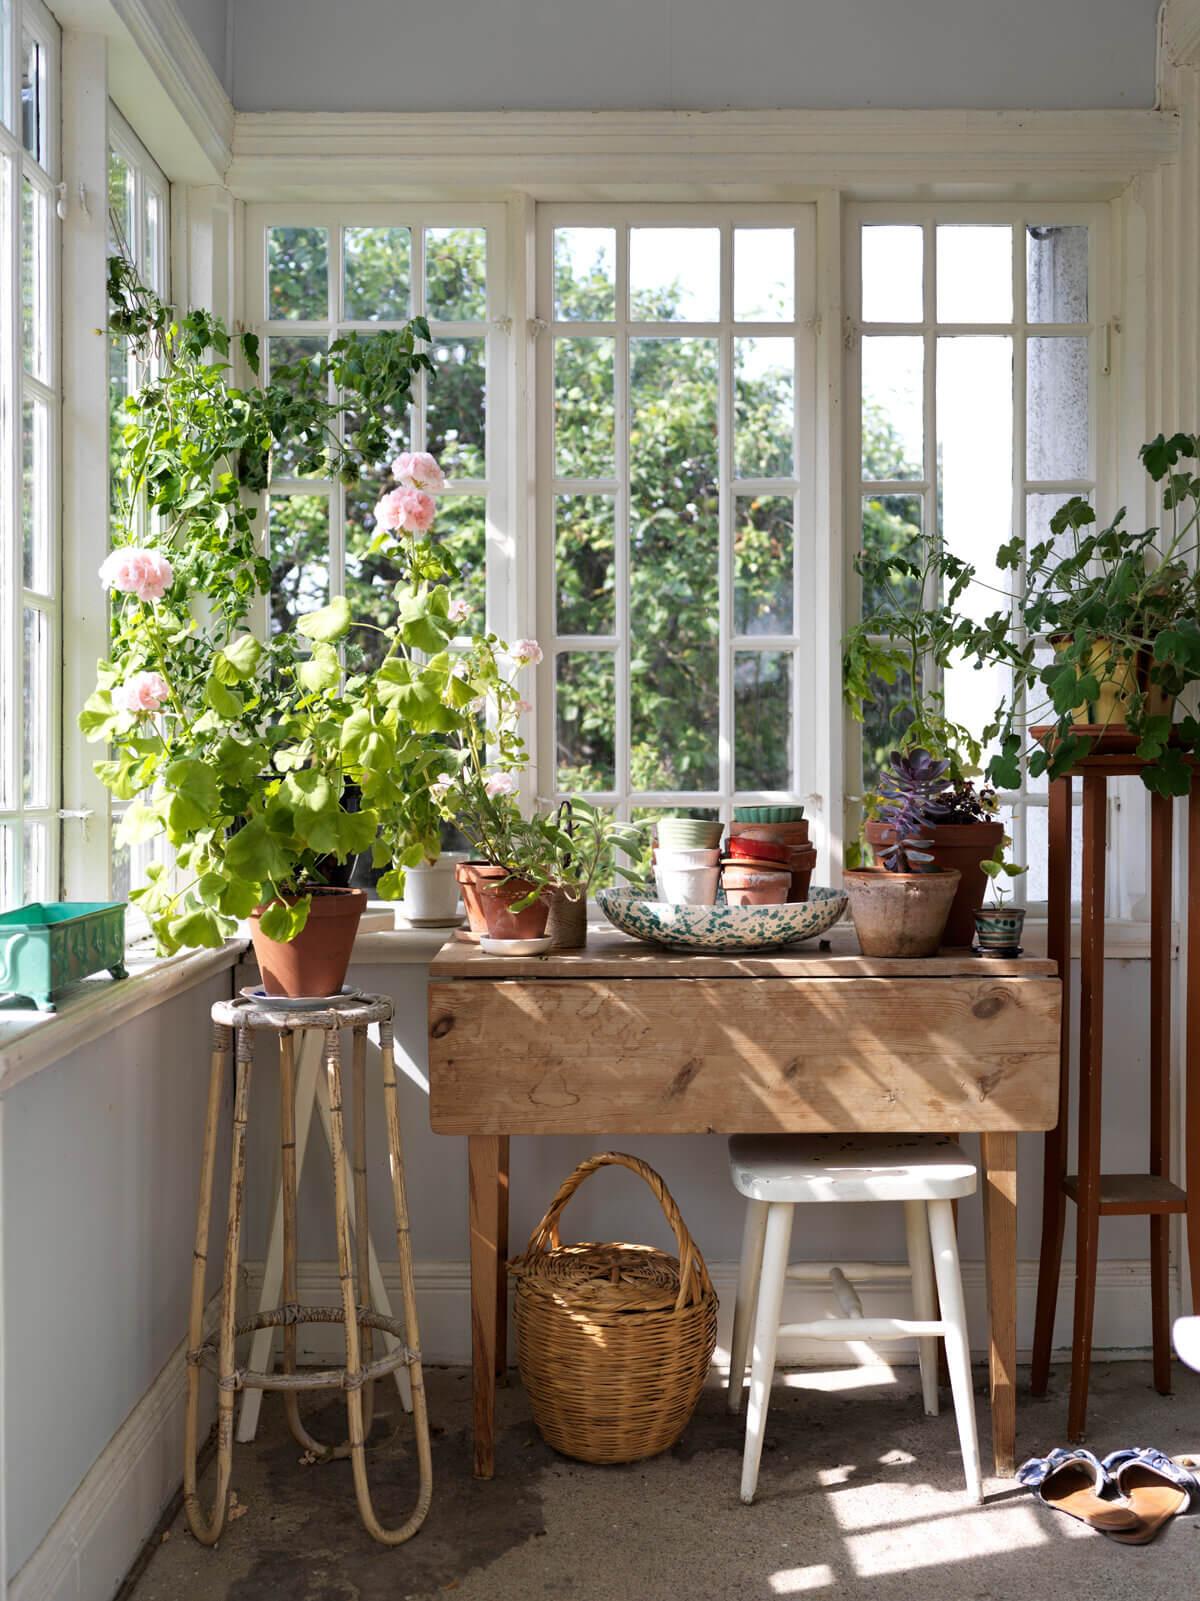 Elsa Billgren's Charming Vintage Summer House on Gotland